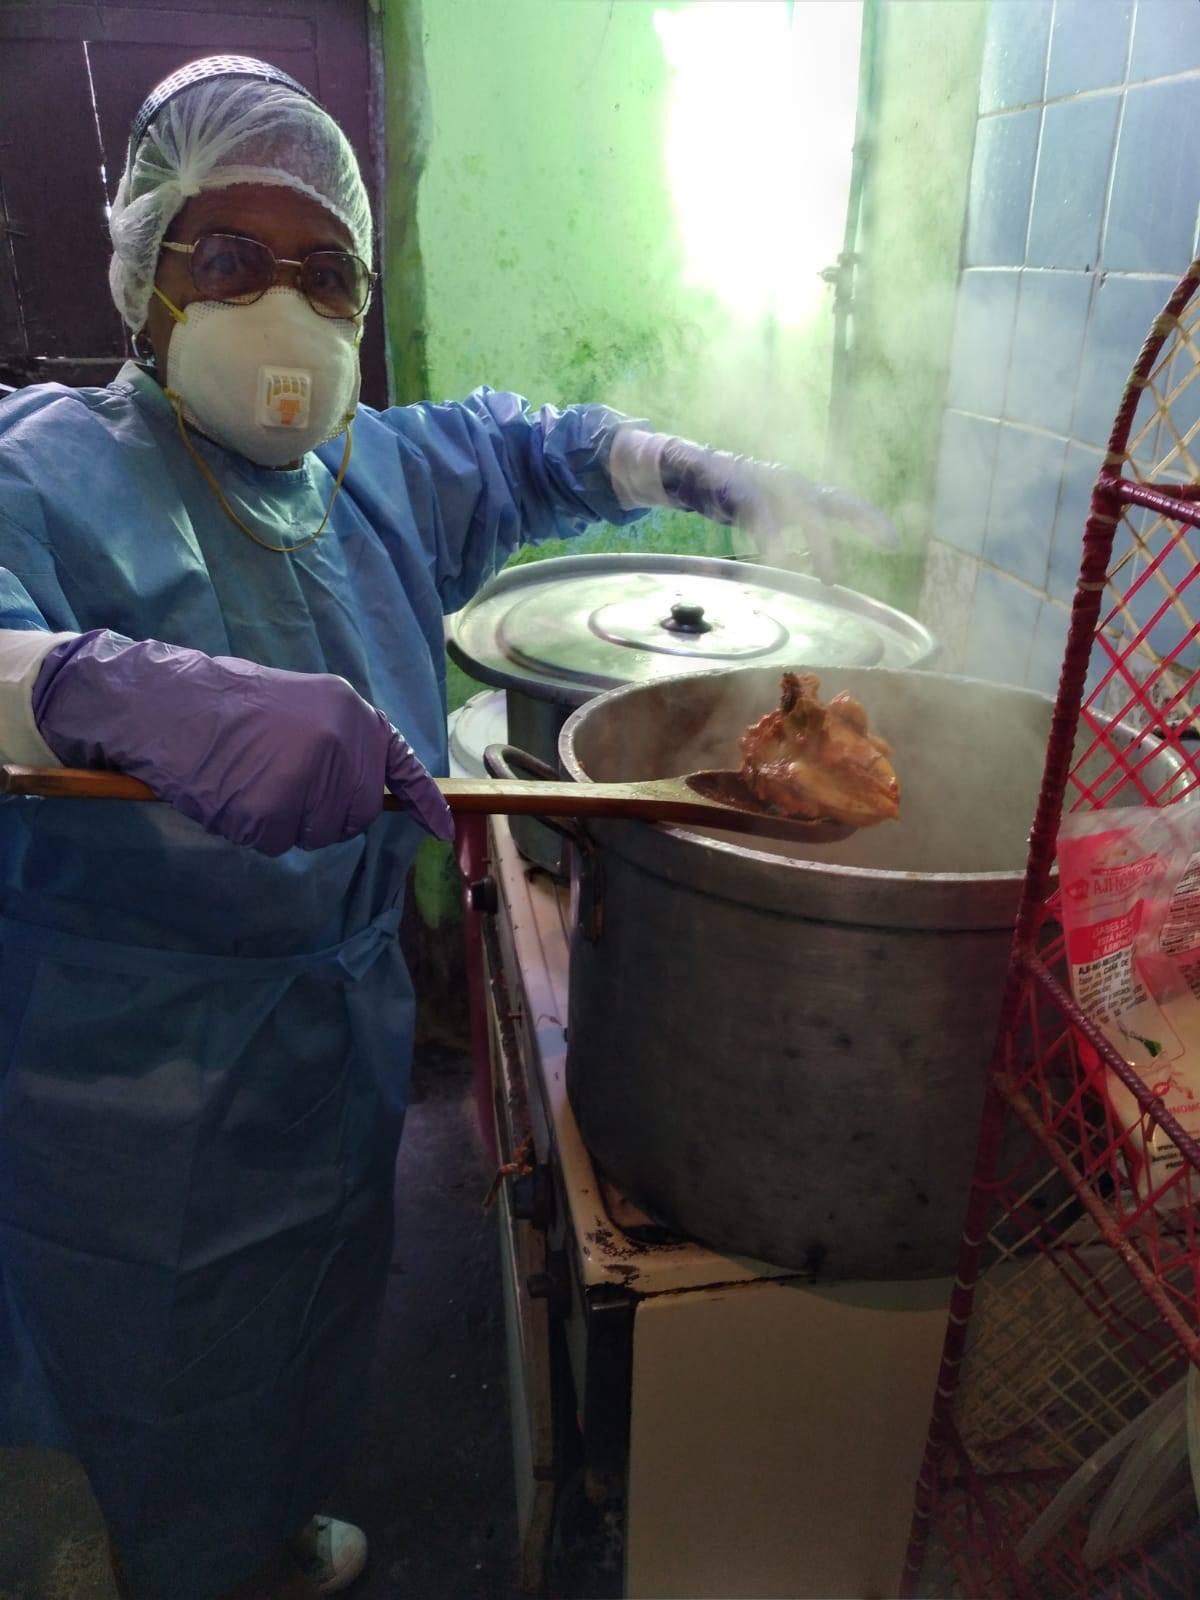 Almuerzo Solidario - Pisco - Preparing a meal for the Solidarity Lunch in Pisco, Perú